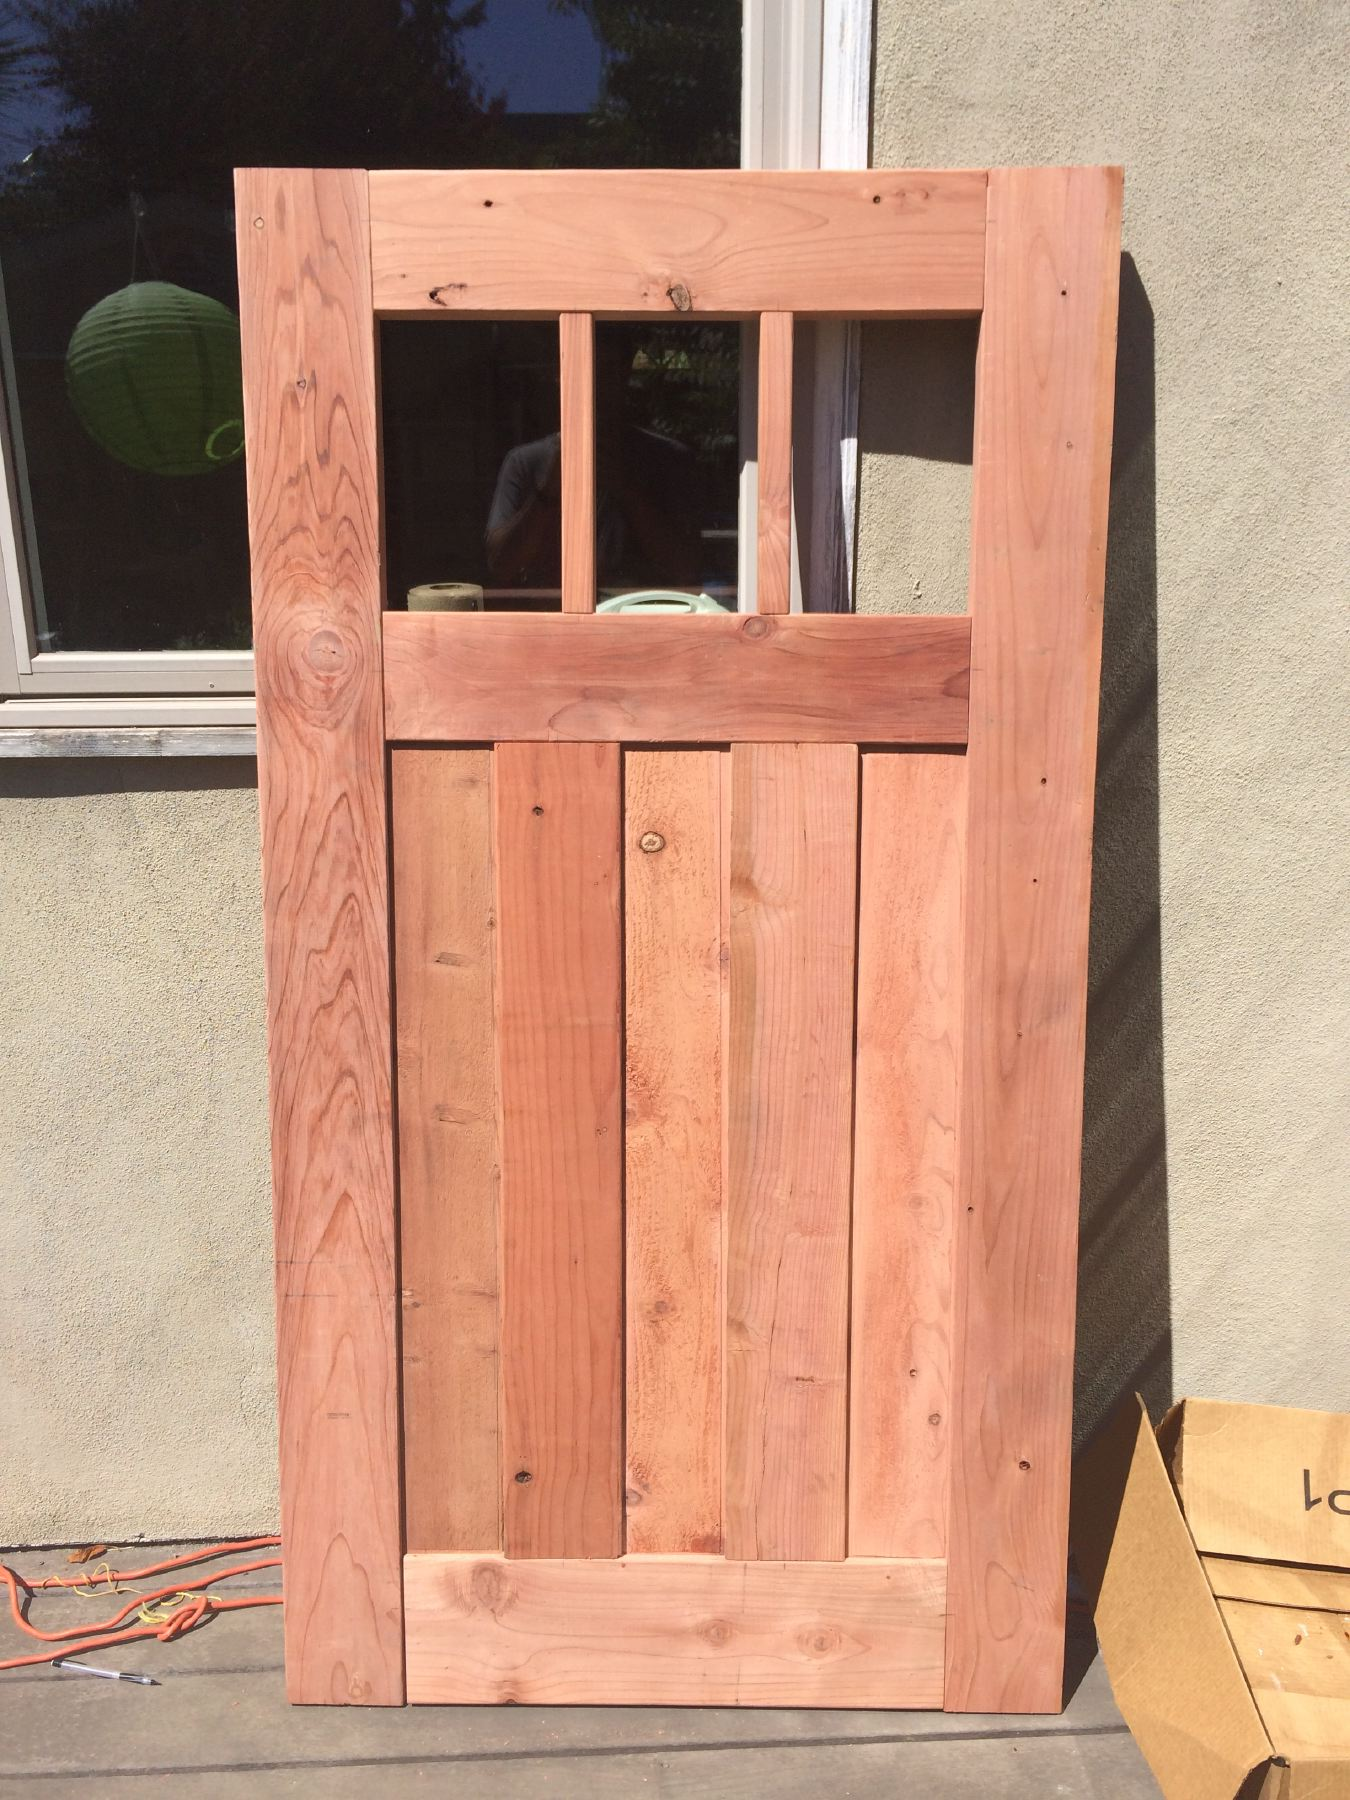 Designing And Building A Redwood Craftsman Fence Gate For